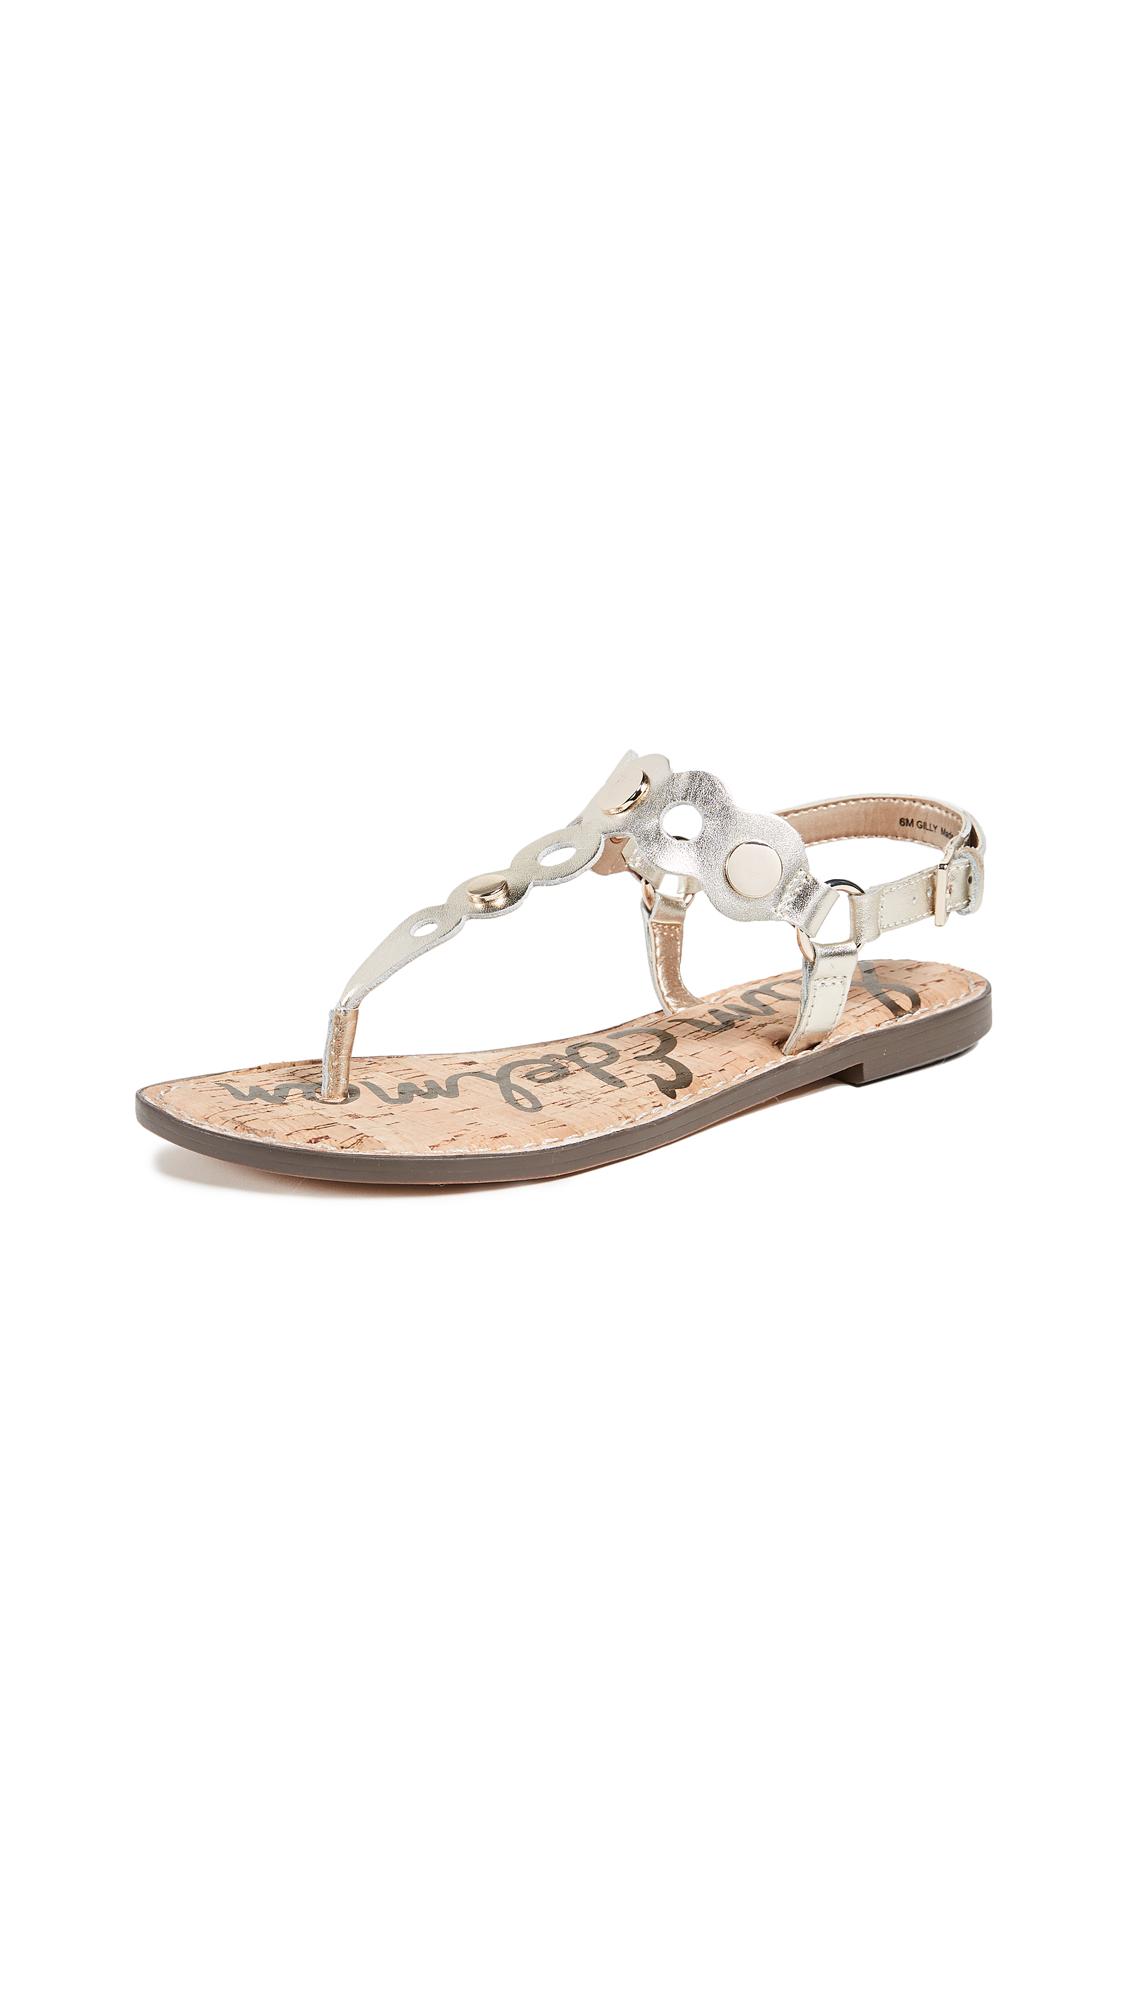 Sam Edelman Gilly Flat Sandals - Jute